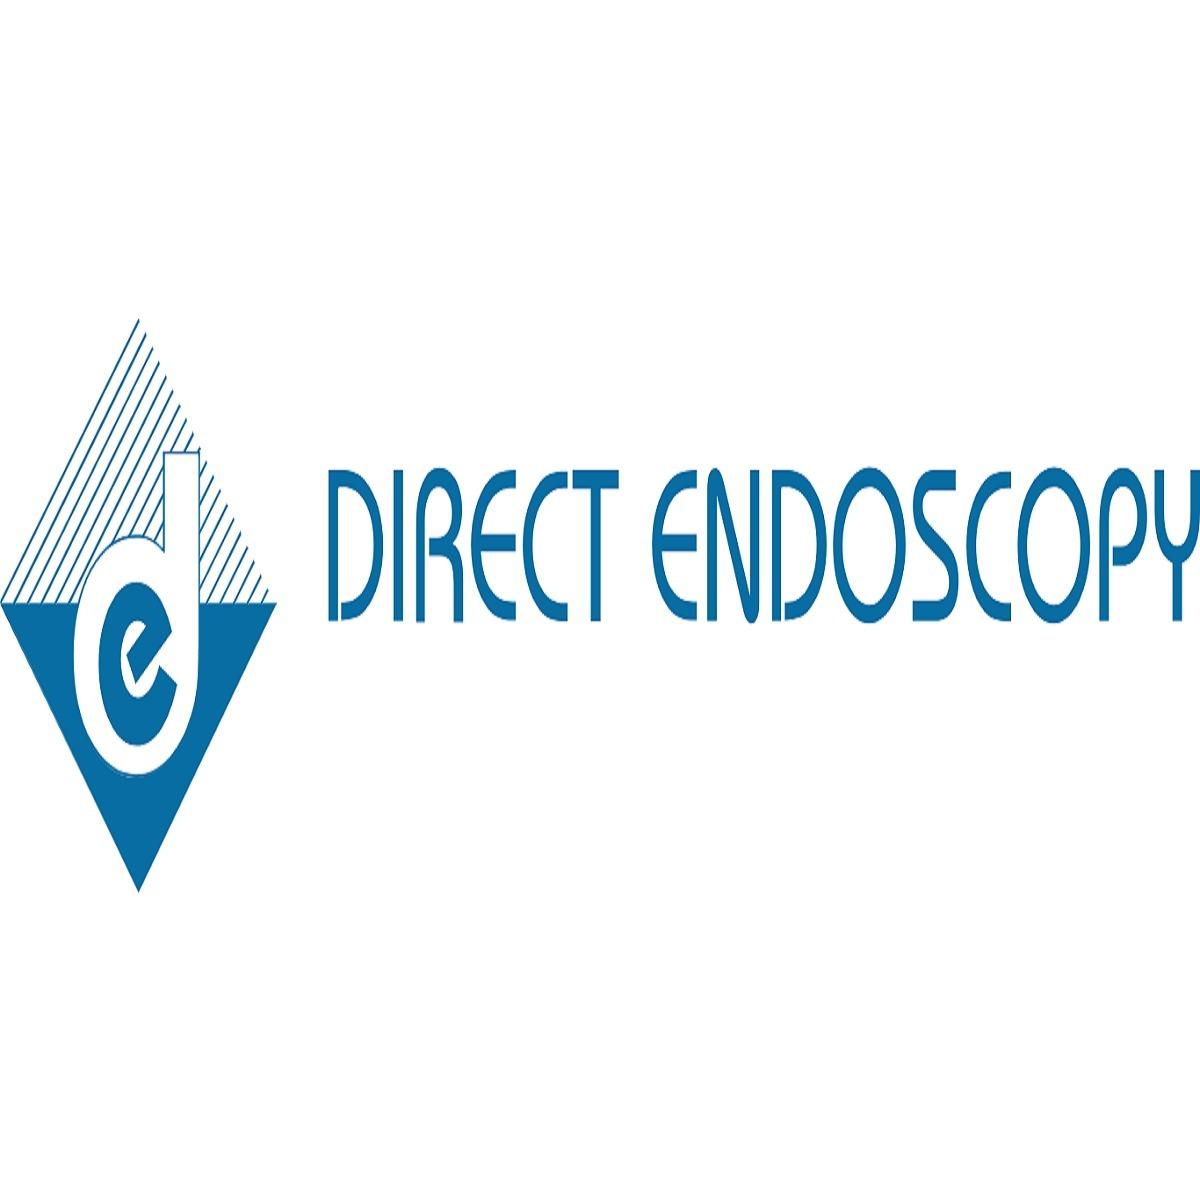 Direct Endoscopy (@directendoscopy) Cover Image